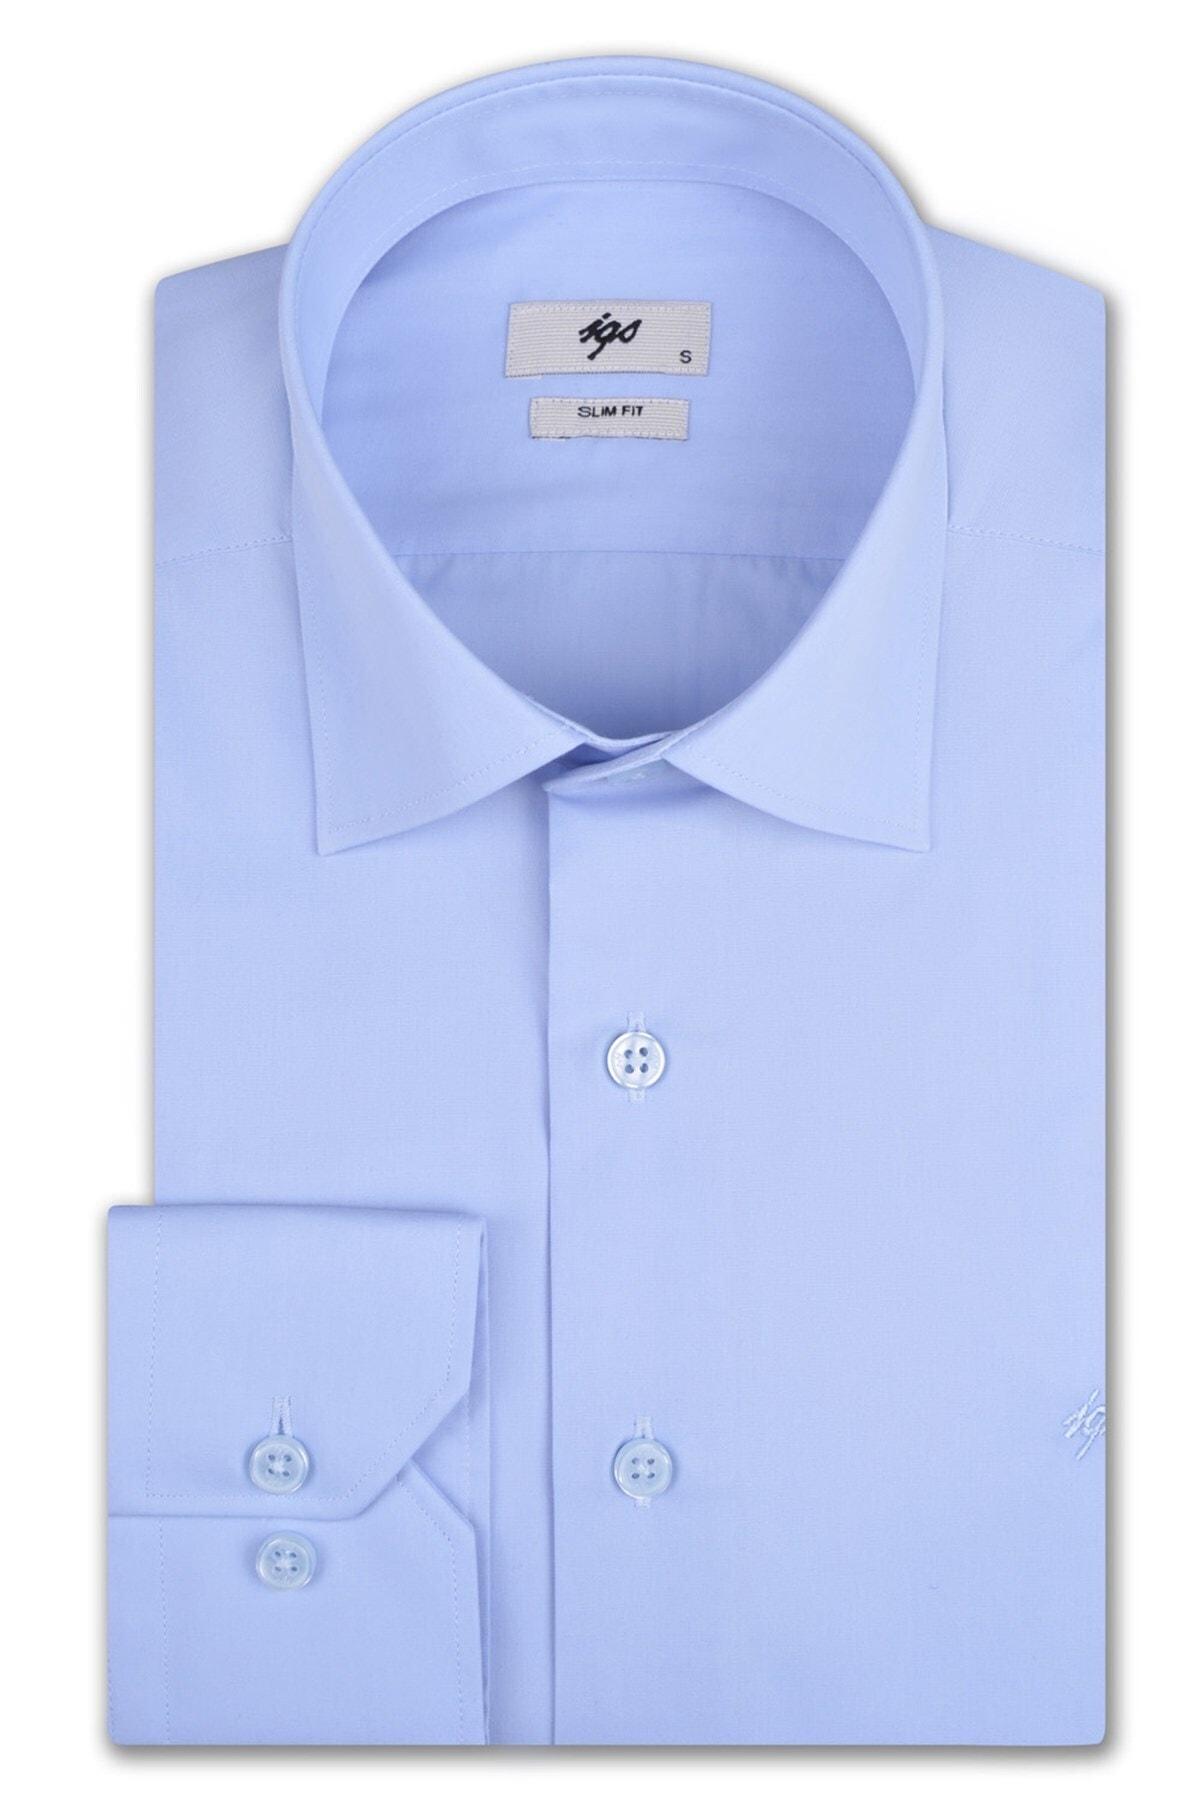 İgs Erkek Açık Mavi Slim Fit Gömlek 1